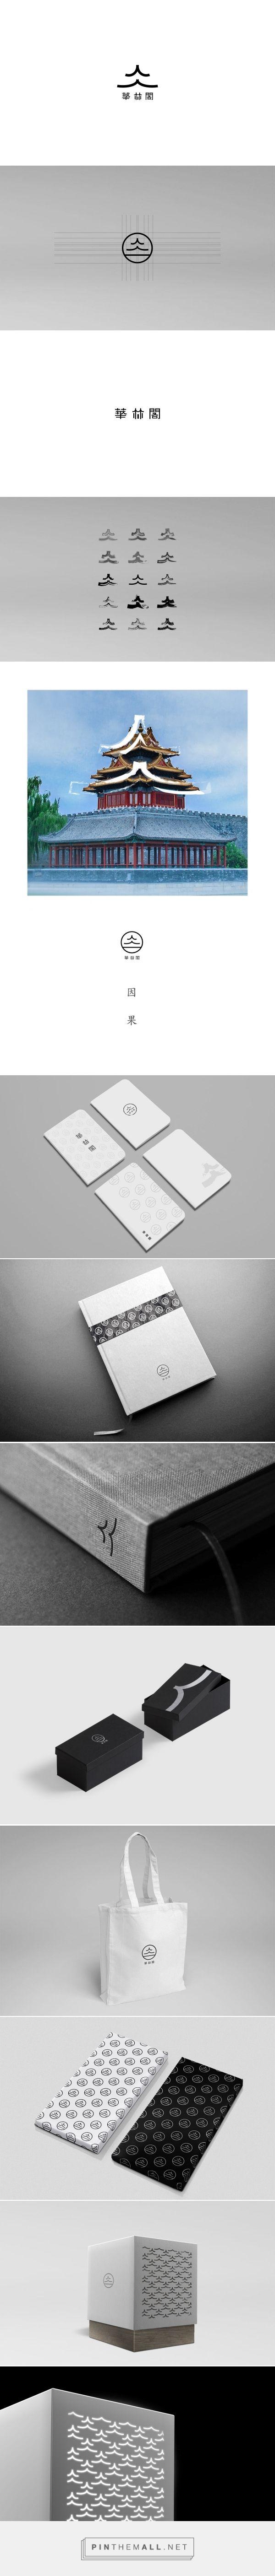 Hua Lin Ge temple brand packaging design by WingYang - http://www.packagingoftheworld.com/2016/12/hua-lin-ge.html